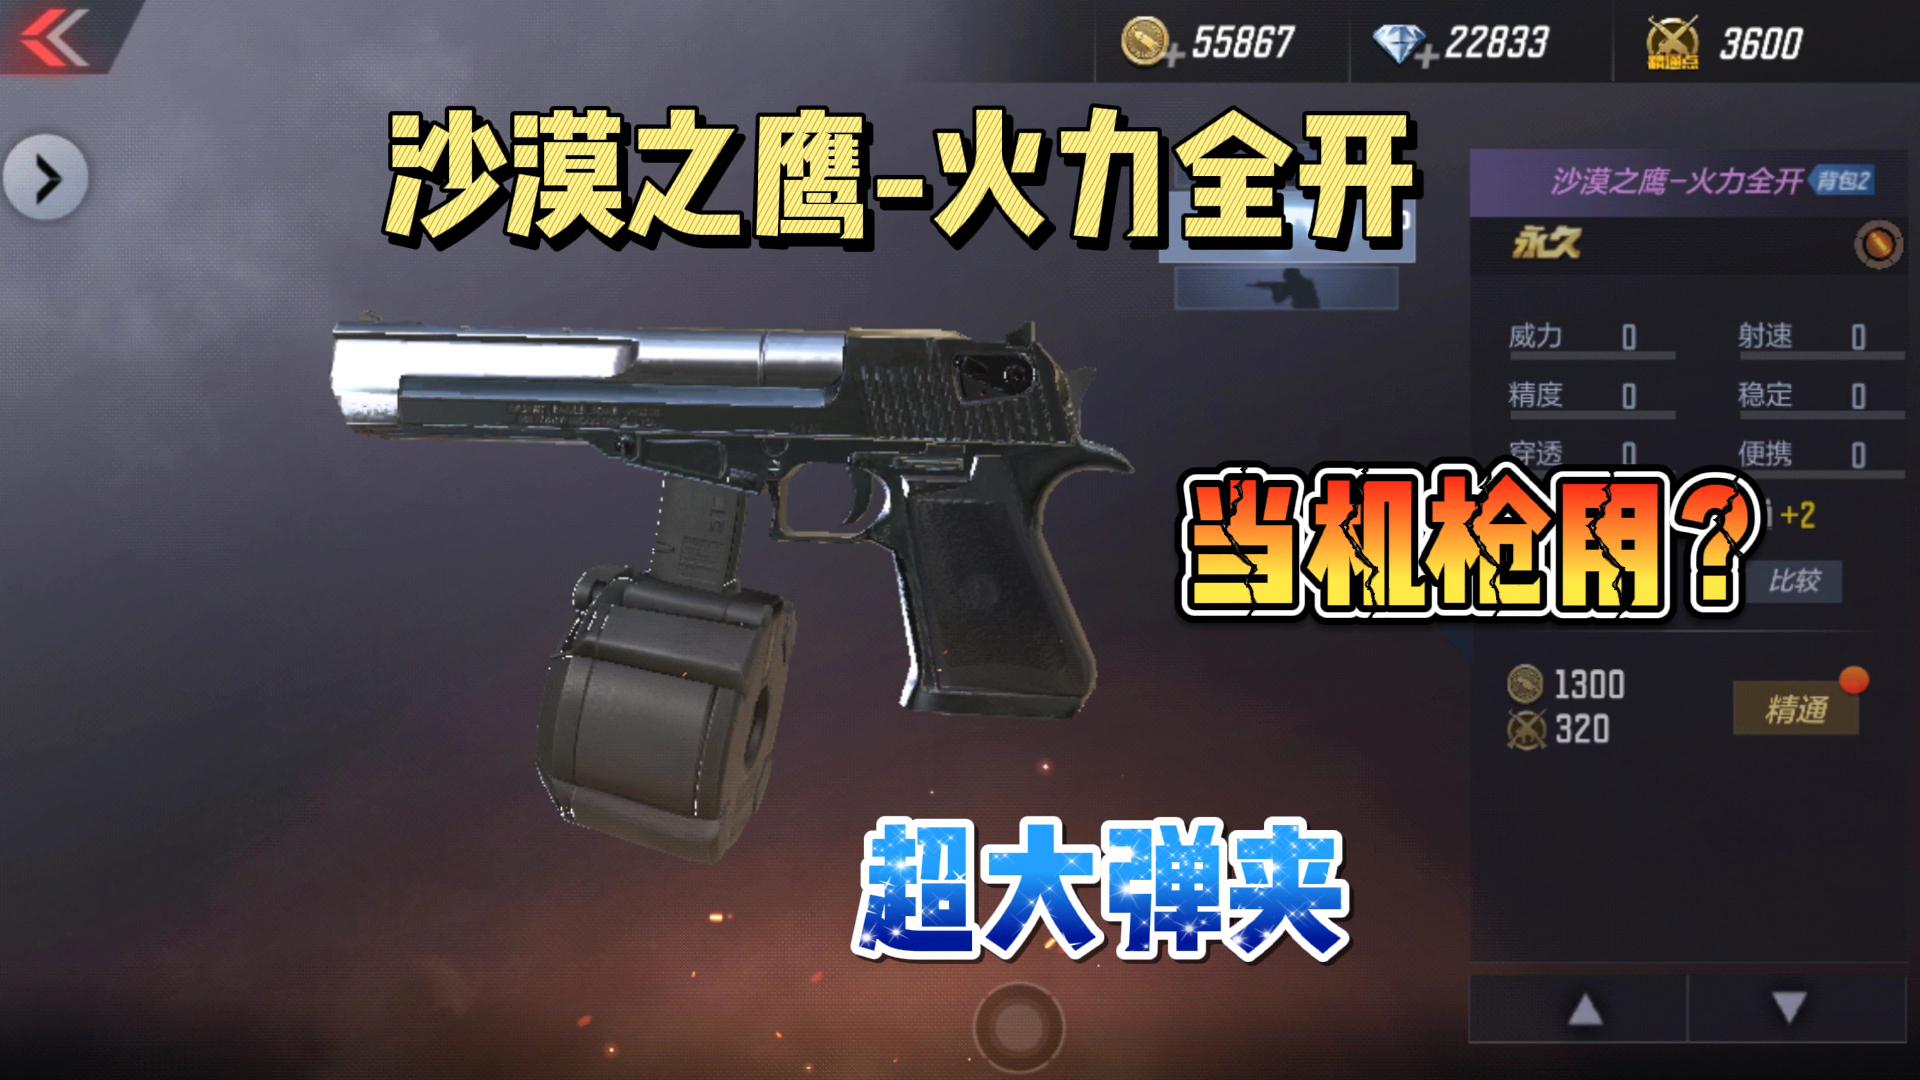 CF手游:沙鹰-火力全开试玩,这么大的弹夹可以当机枪用?